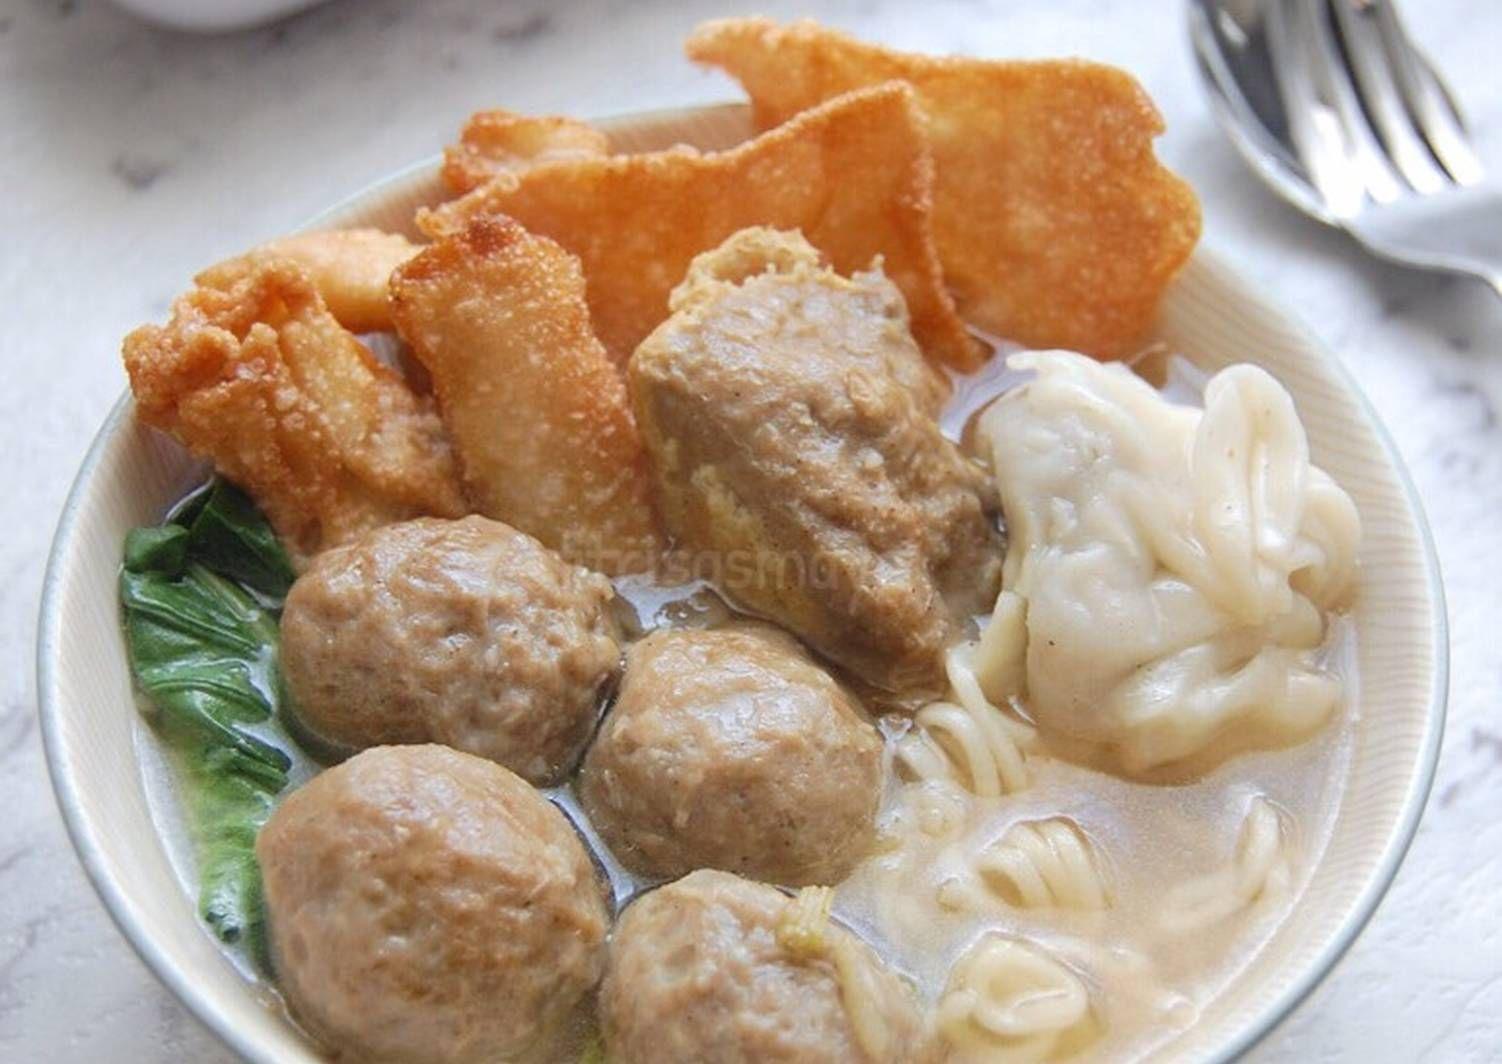 Resep Bakso Malang Oleh Fitri Sasmaya Resep Bakso Makanan Resep